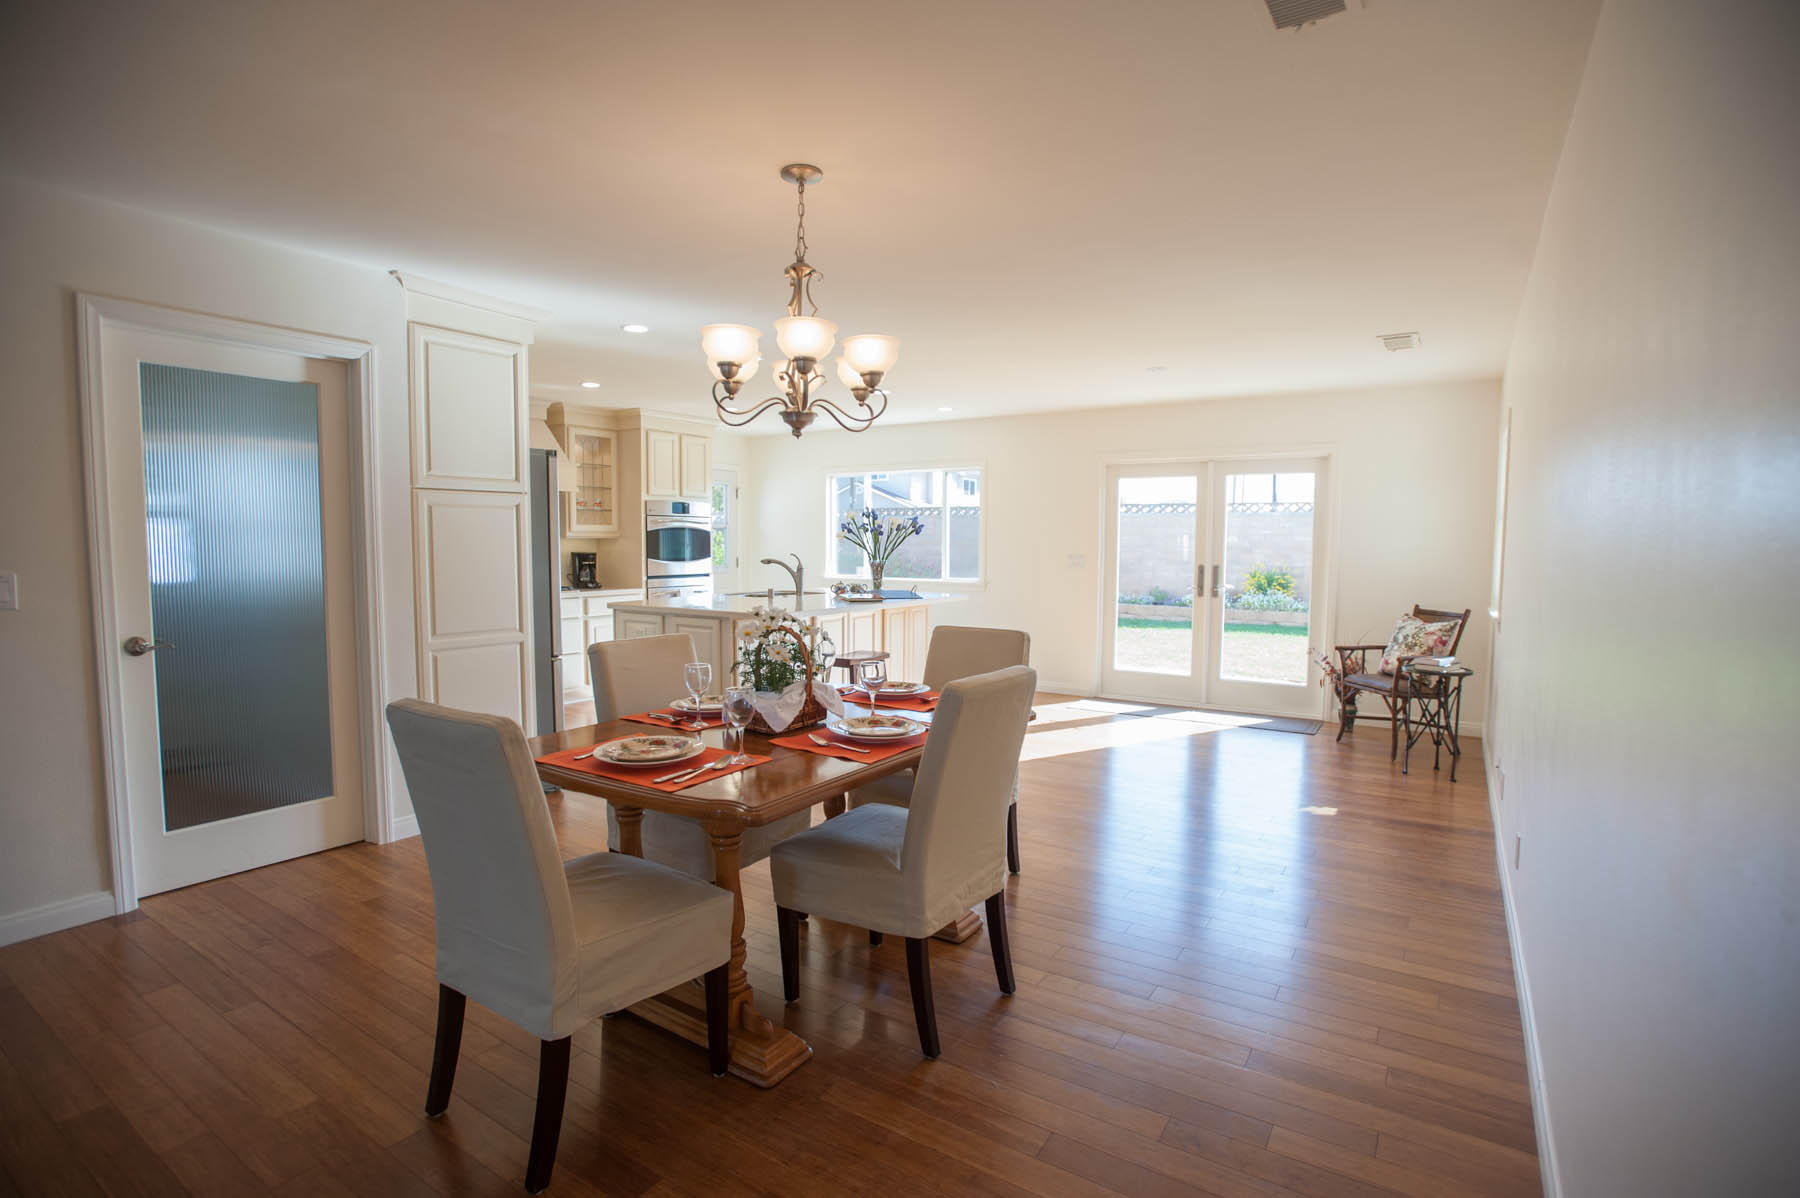 Property photo for 308 Zink Ave Santa Barbara, California 93111 - 14-836